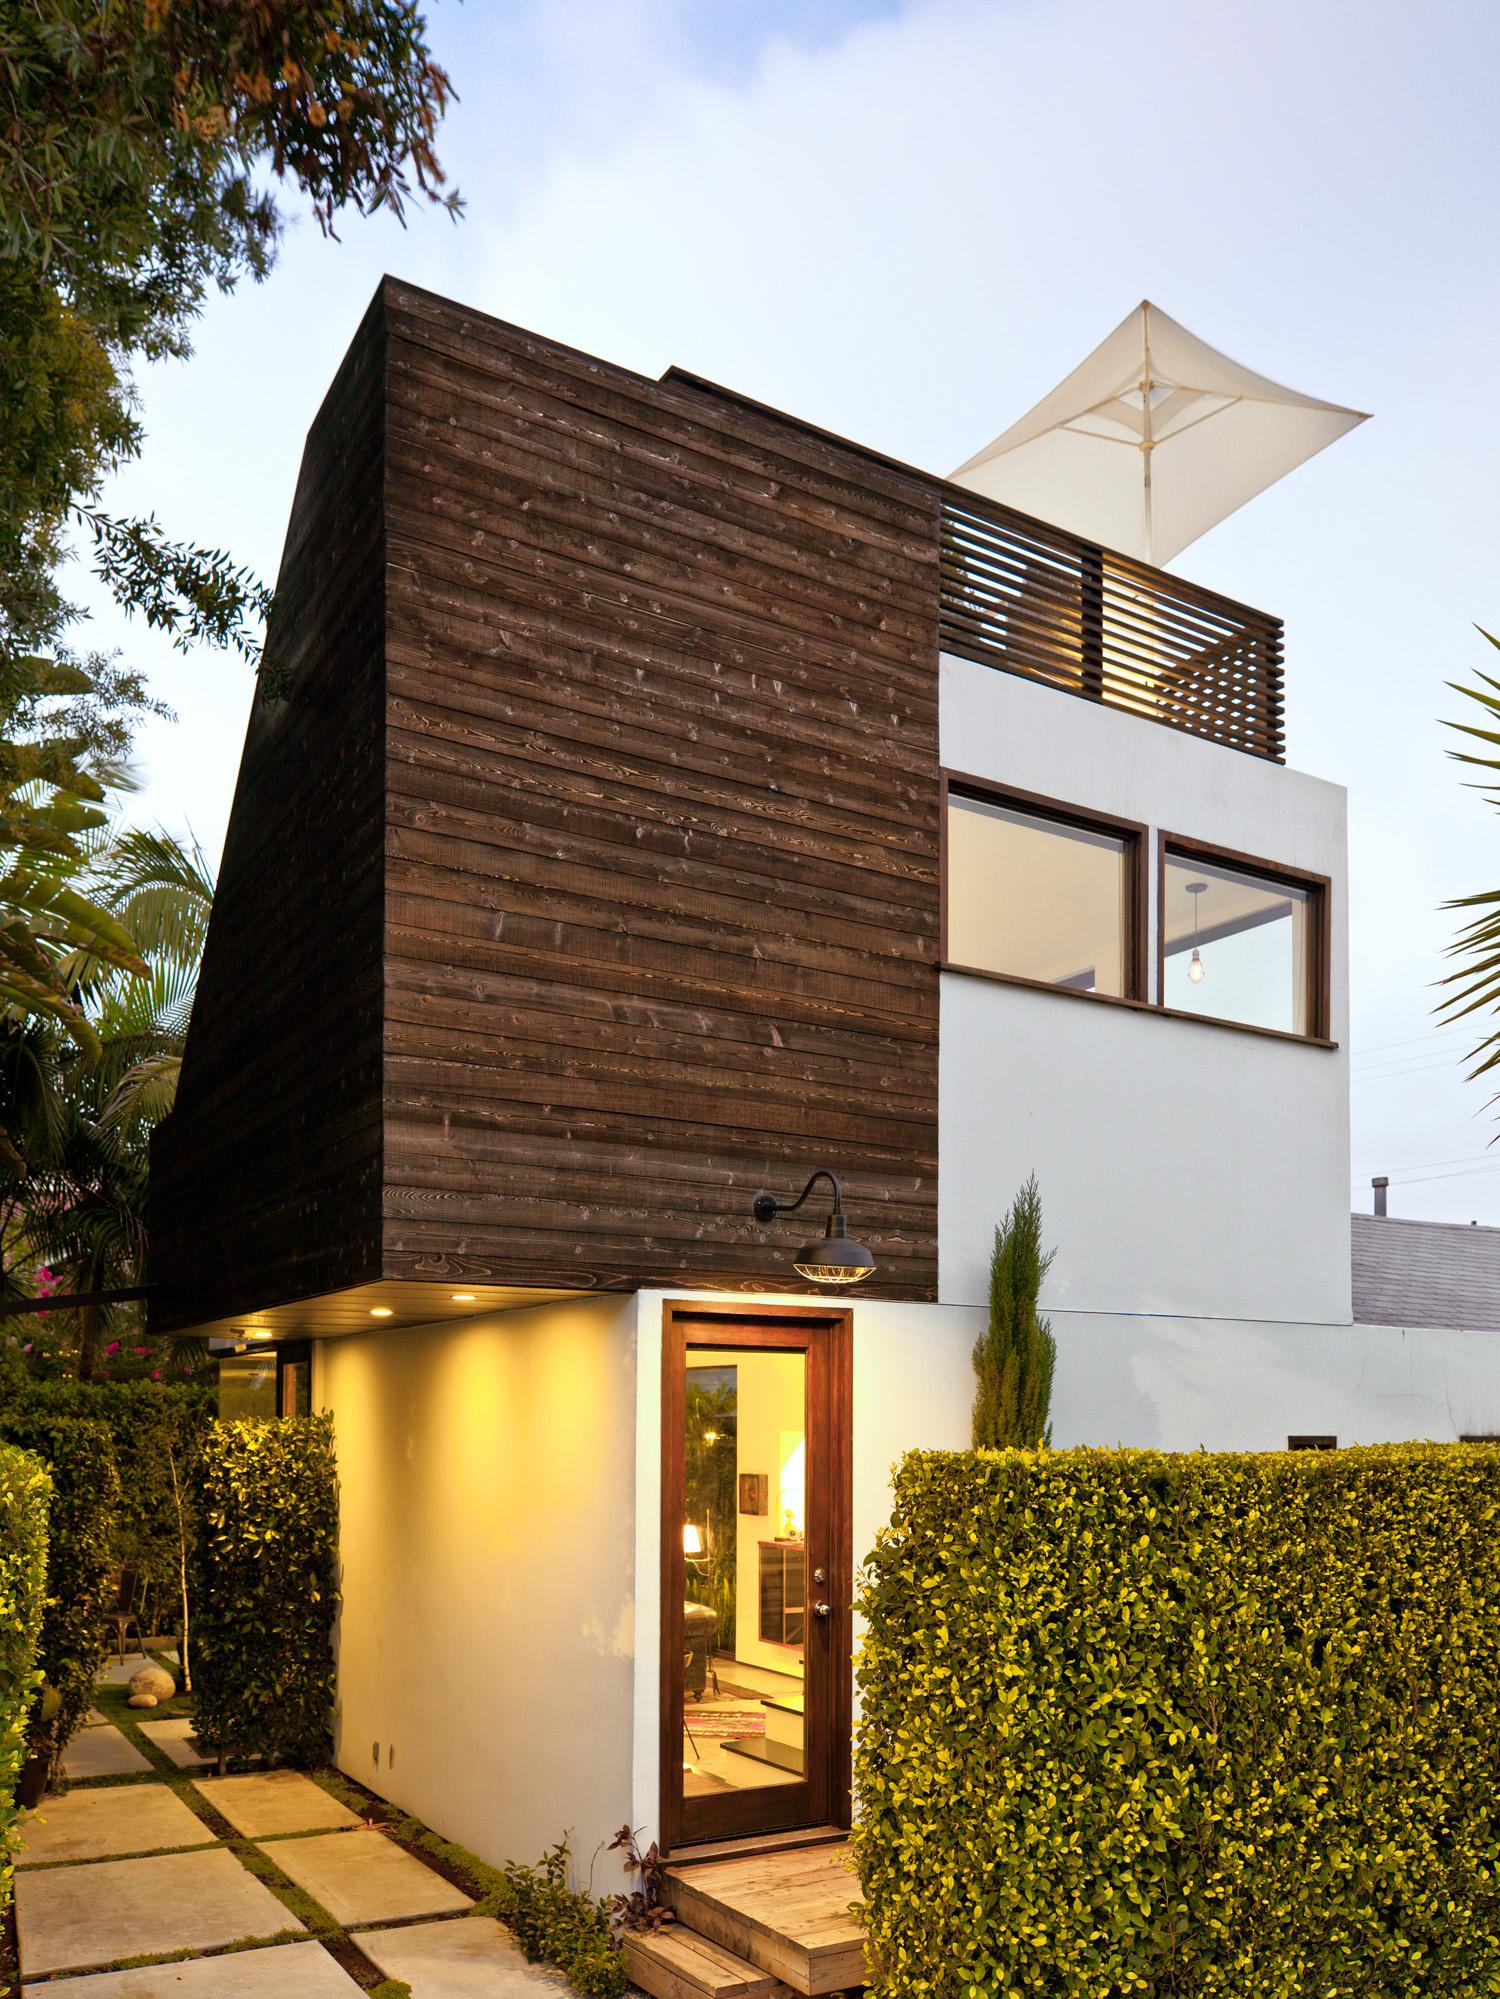 6 design tricks for a small home sunset magazine for Sunset magazine house plans